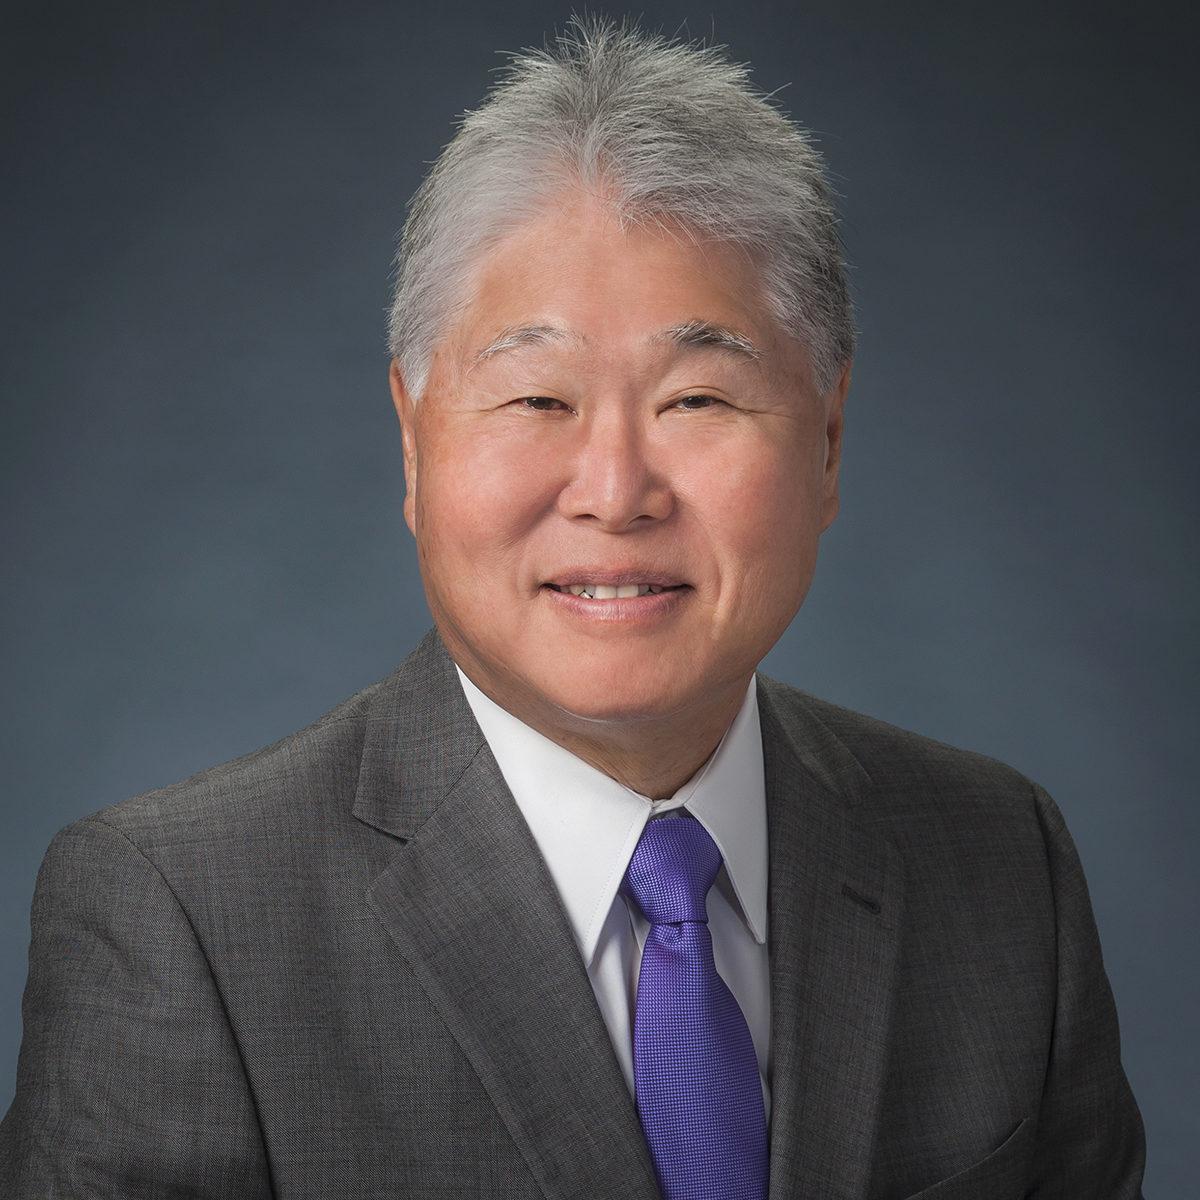 Paul H. Sato